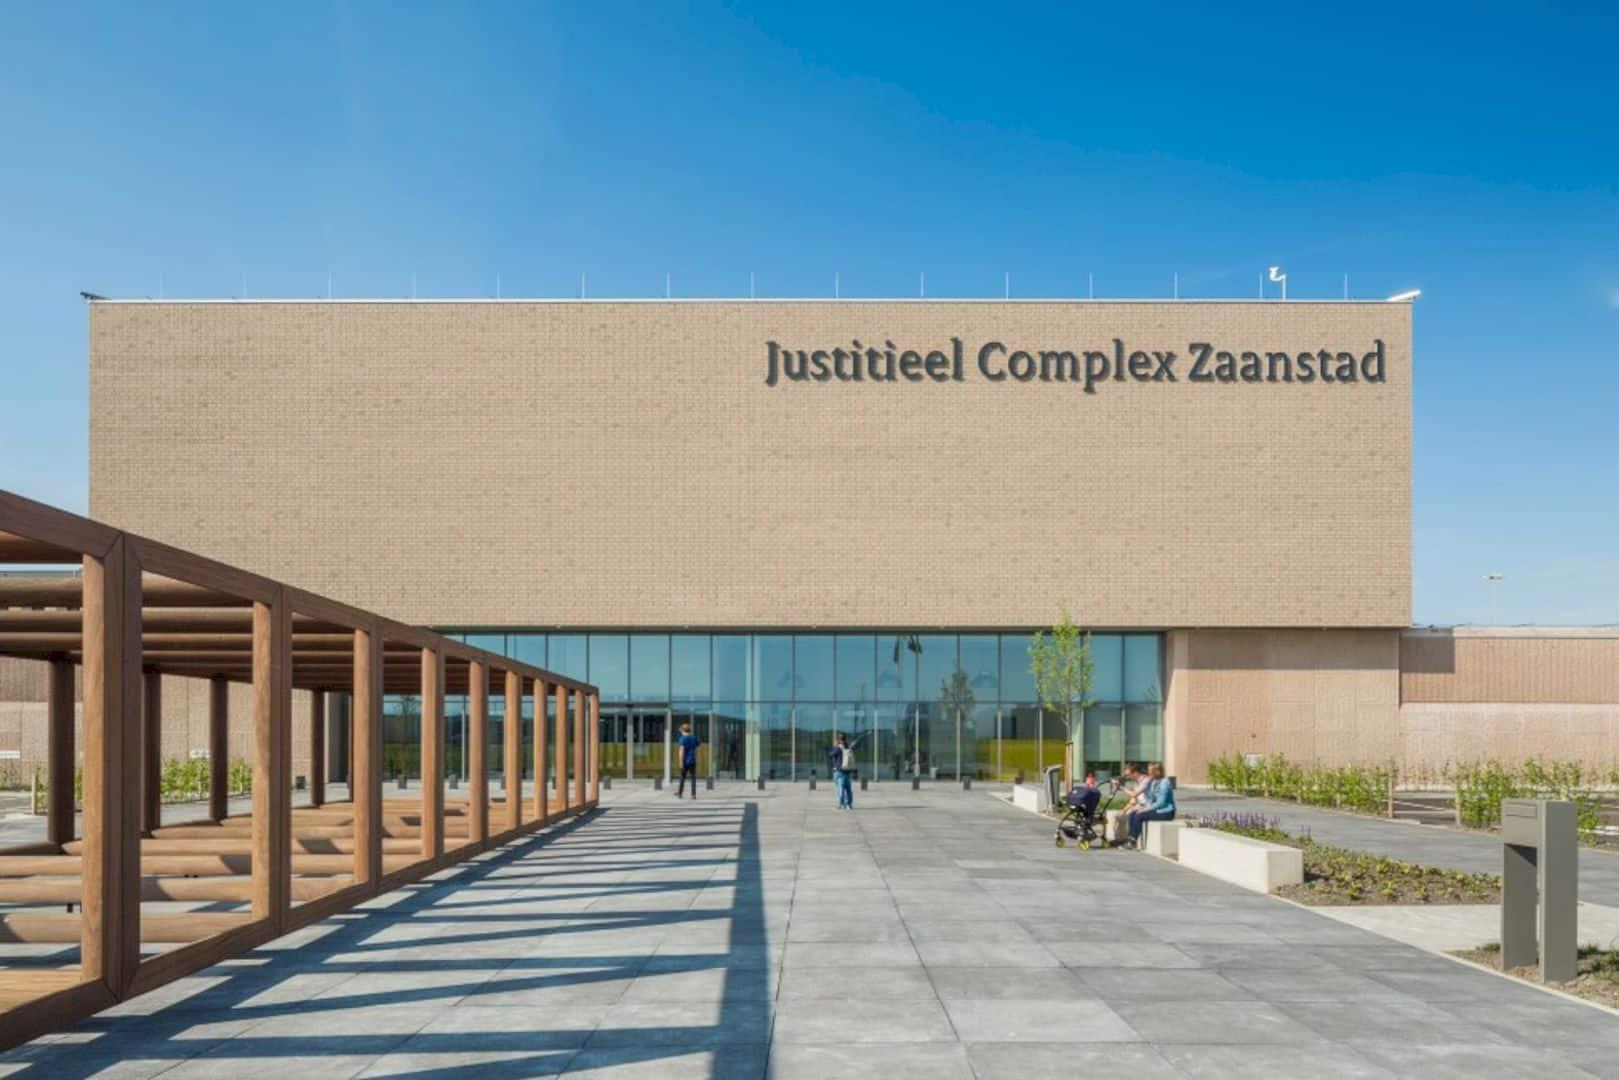 JC Zaanstad The Most Modern and Largest Detention Center in